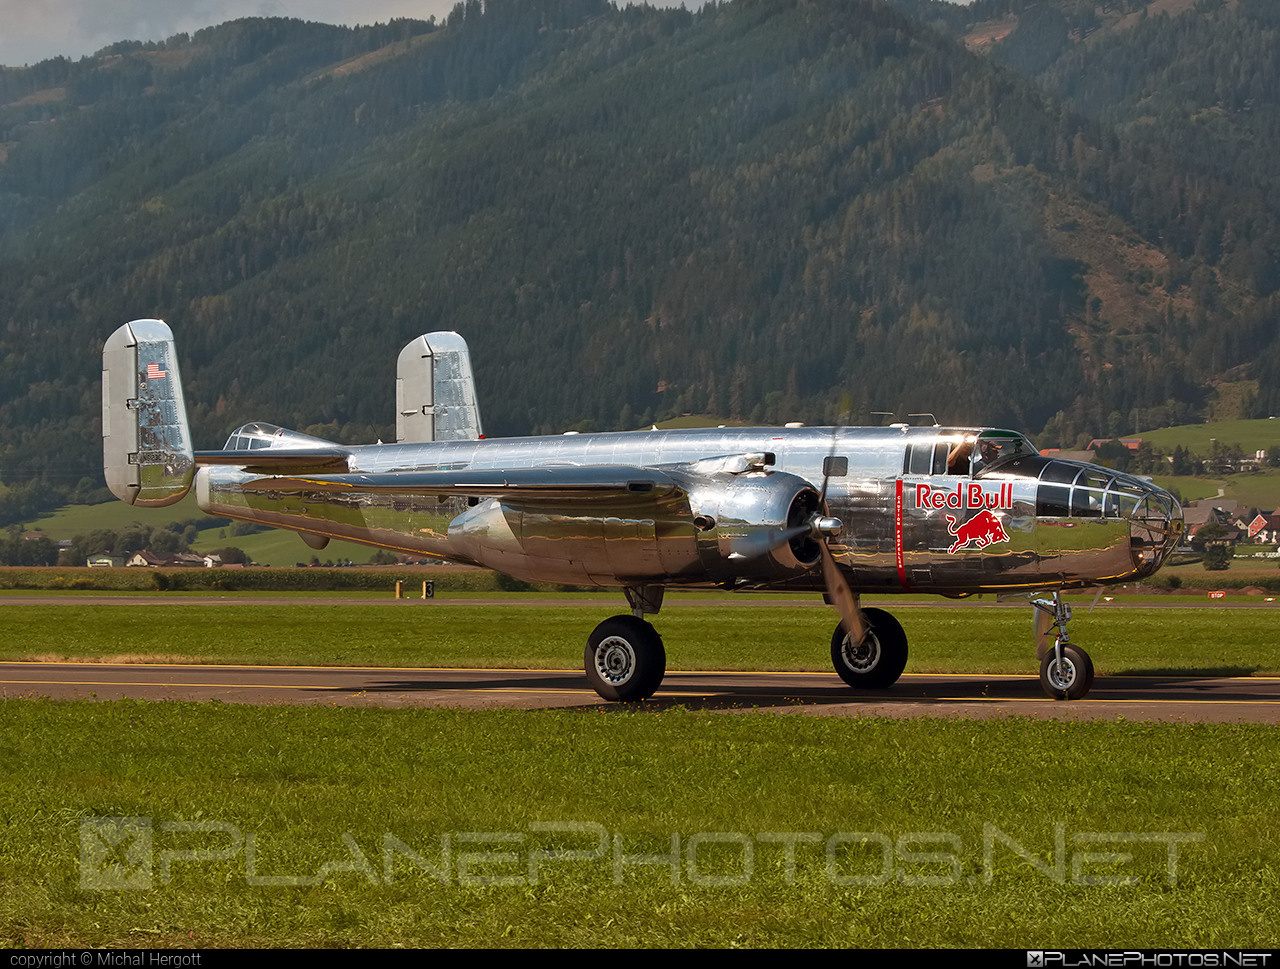 North American B-25J Mitchell - N6123C operated by The Flying Bulls #airpower2016 #b25 #b25j #b25mitchell #northamerican #theflyingbulls